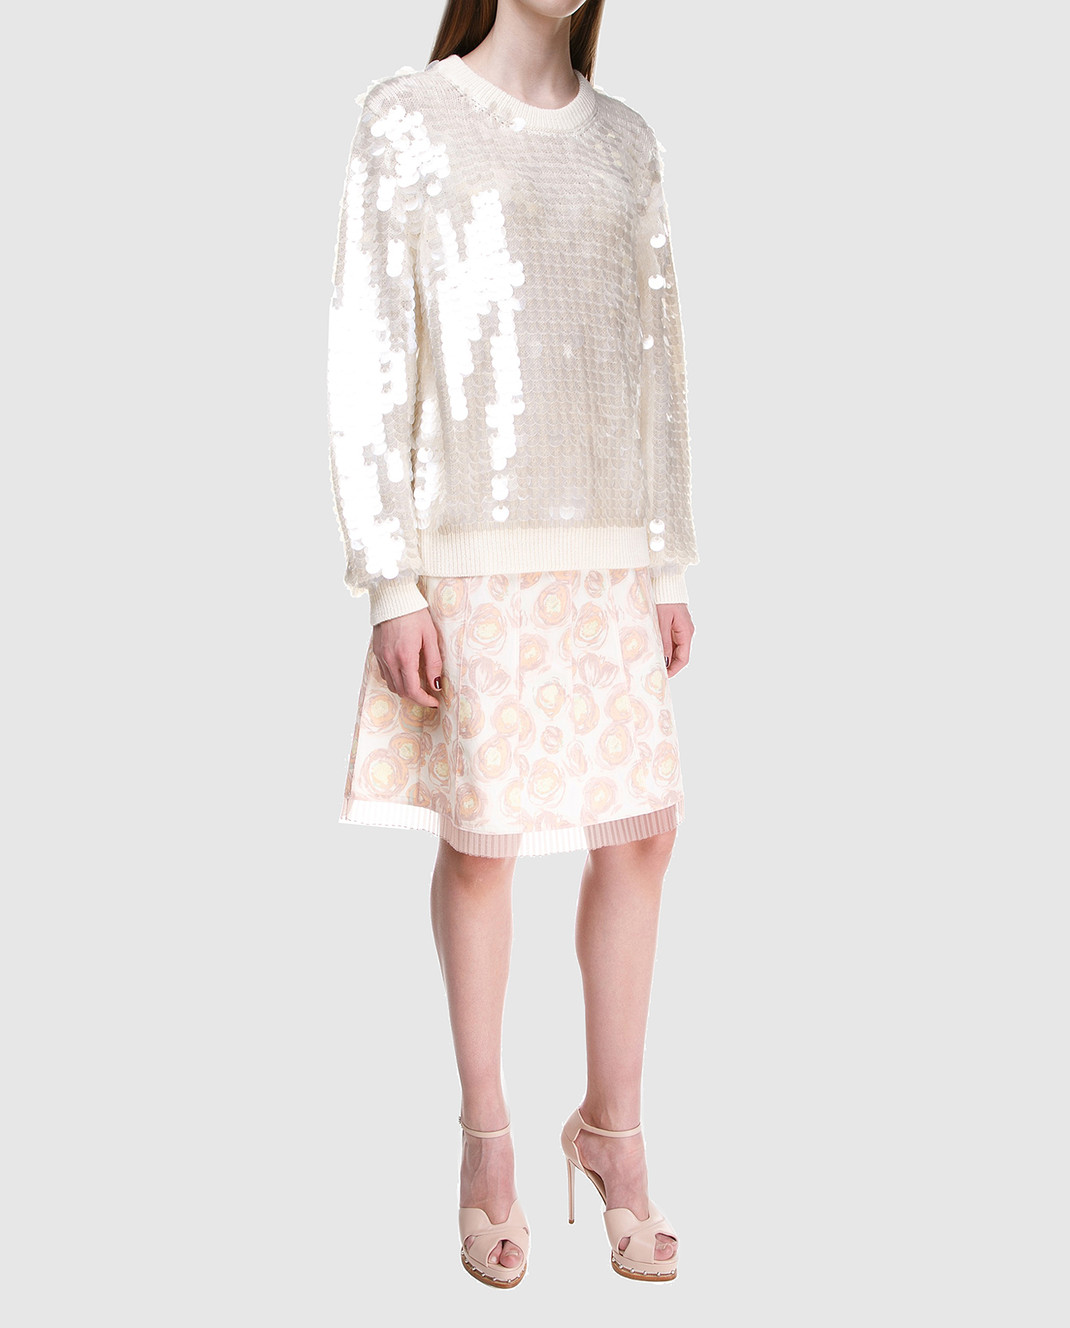 Marc Jacobs Светло-бежевая юбка M4007208 изображение 2